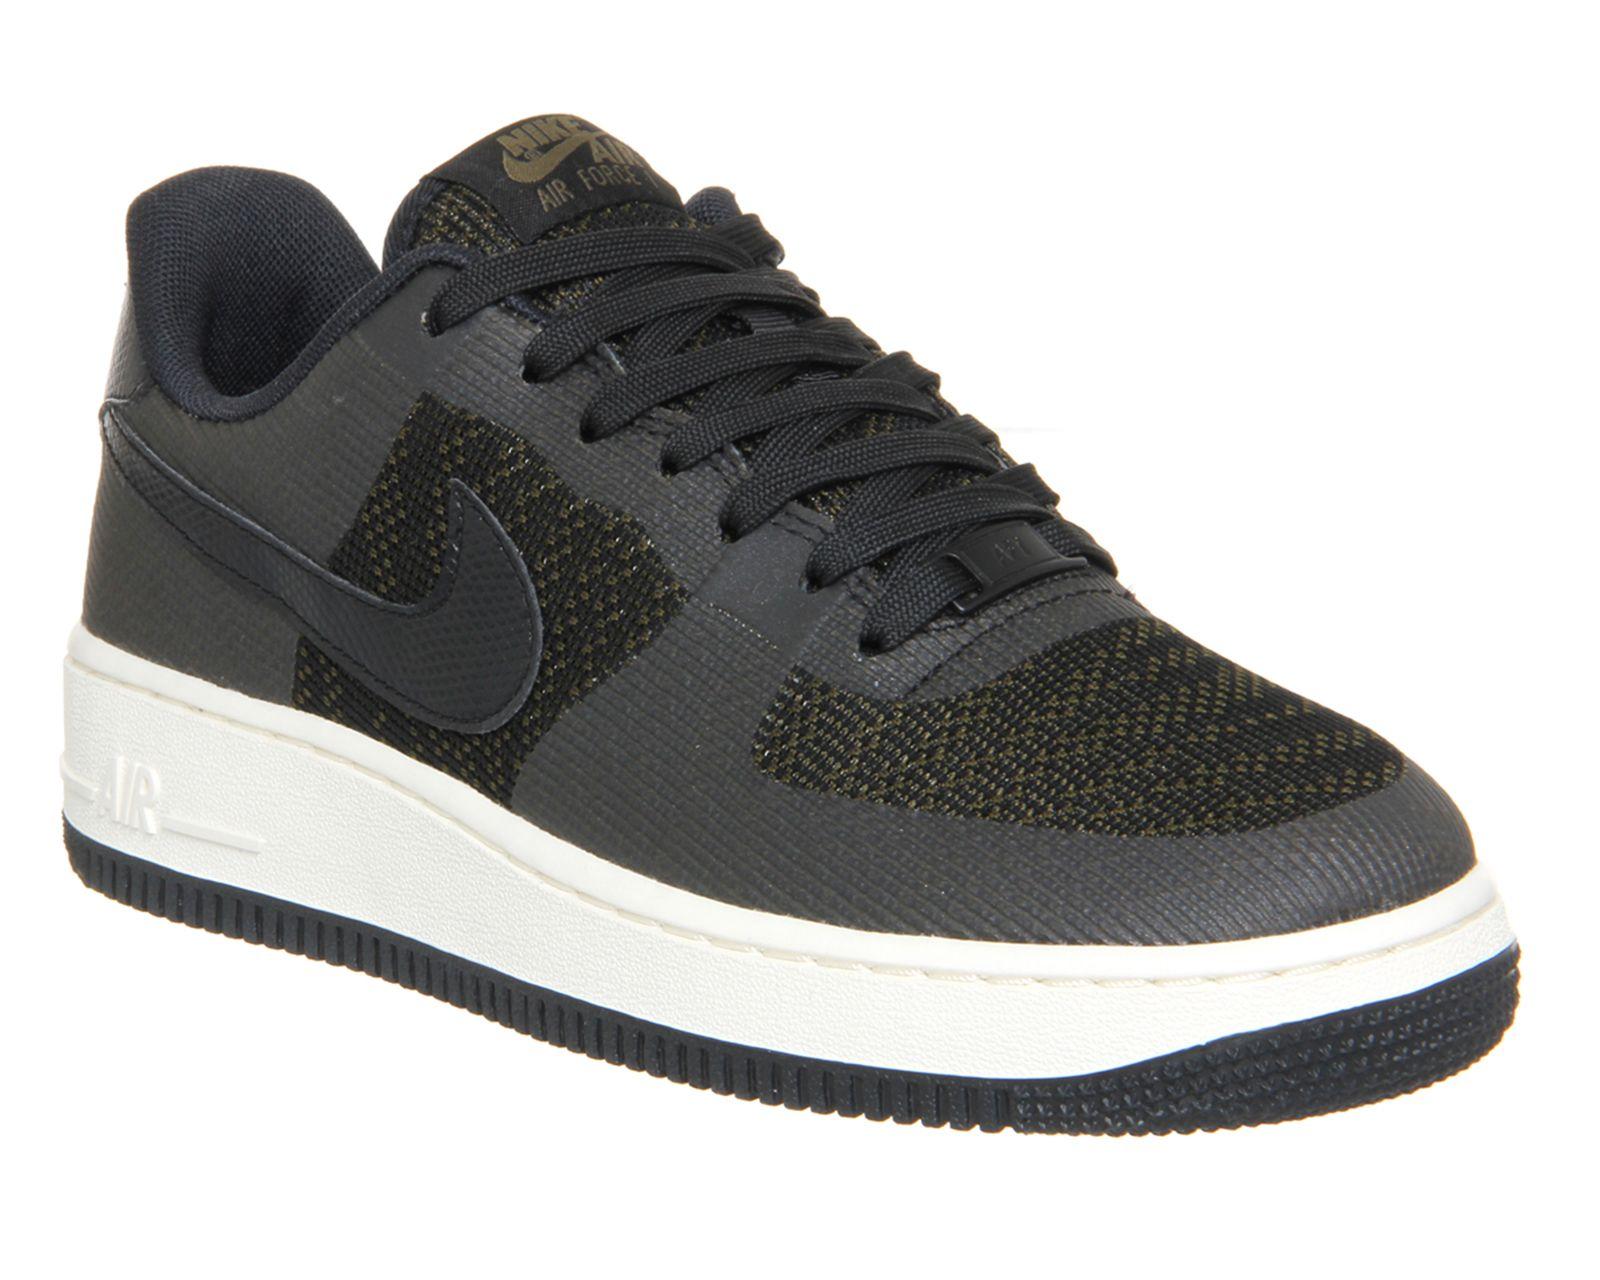 Nike Air Force 1 07 Trainers Medium Olive White Gum Hers